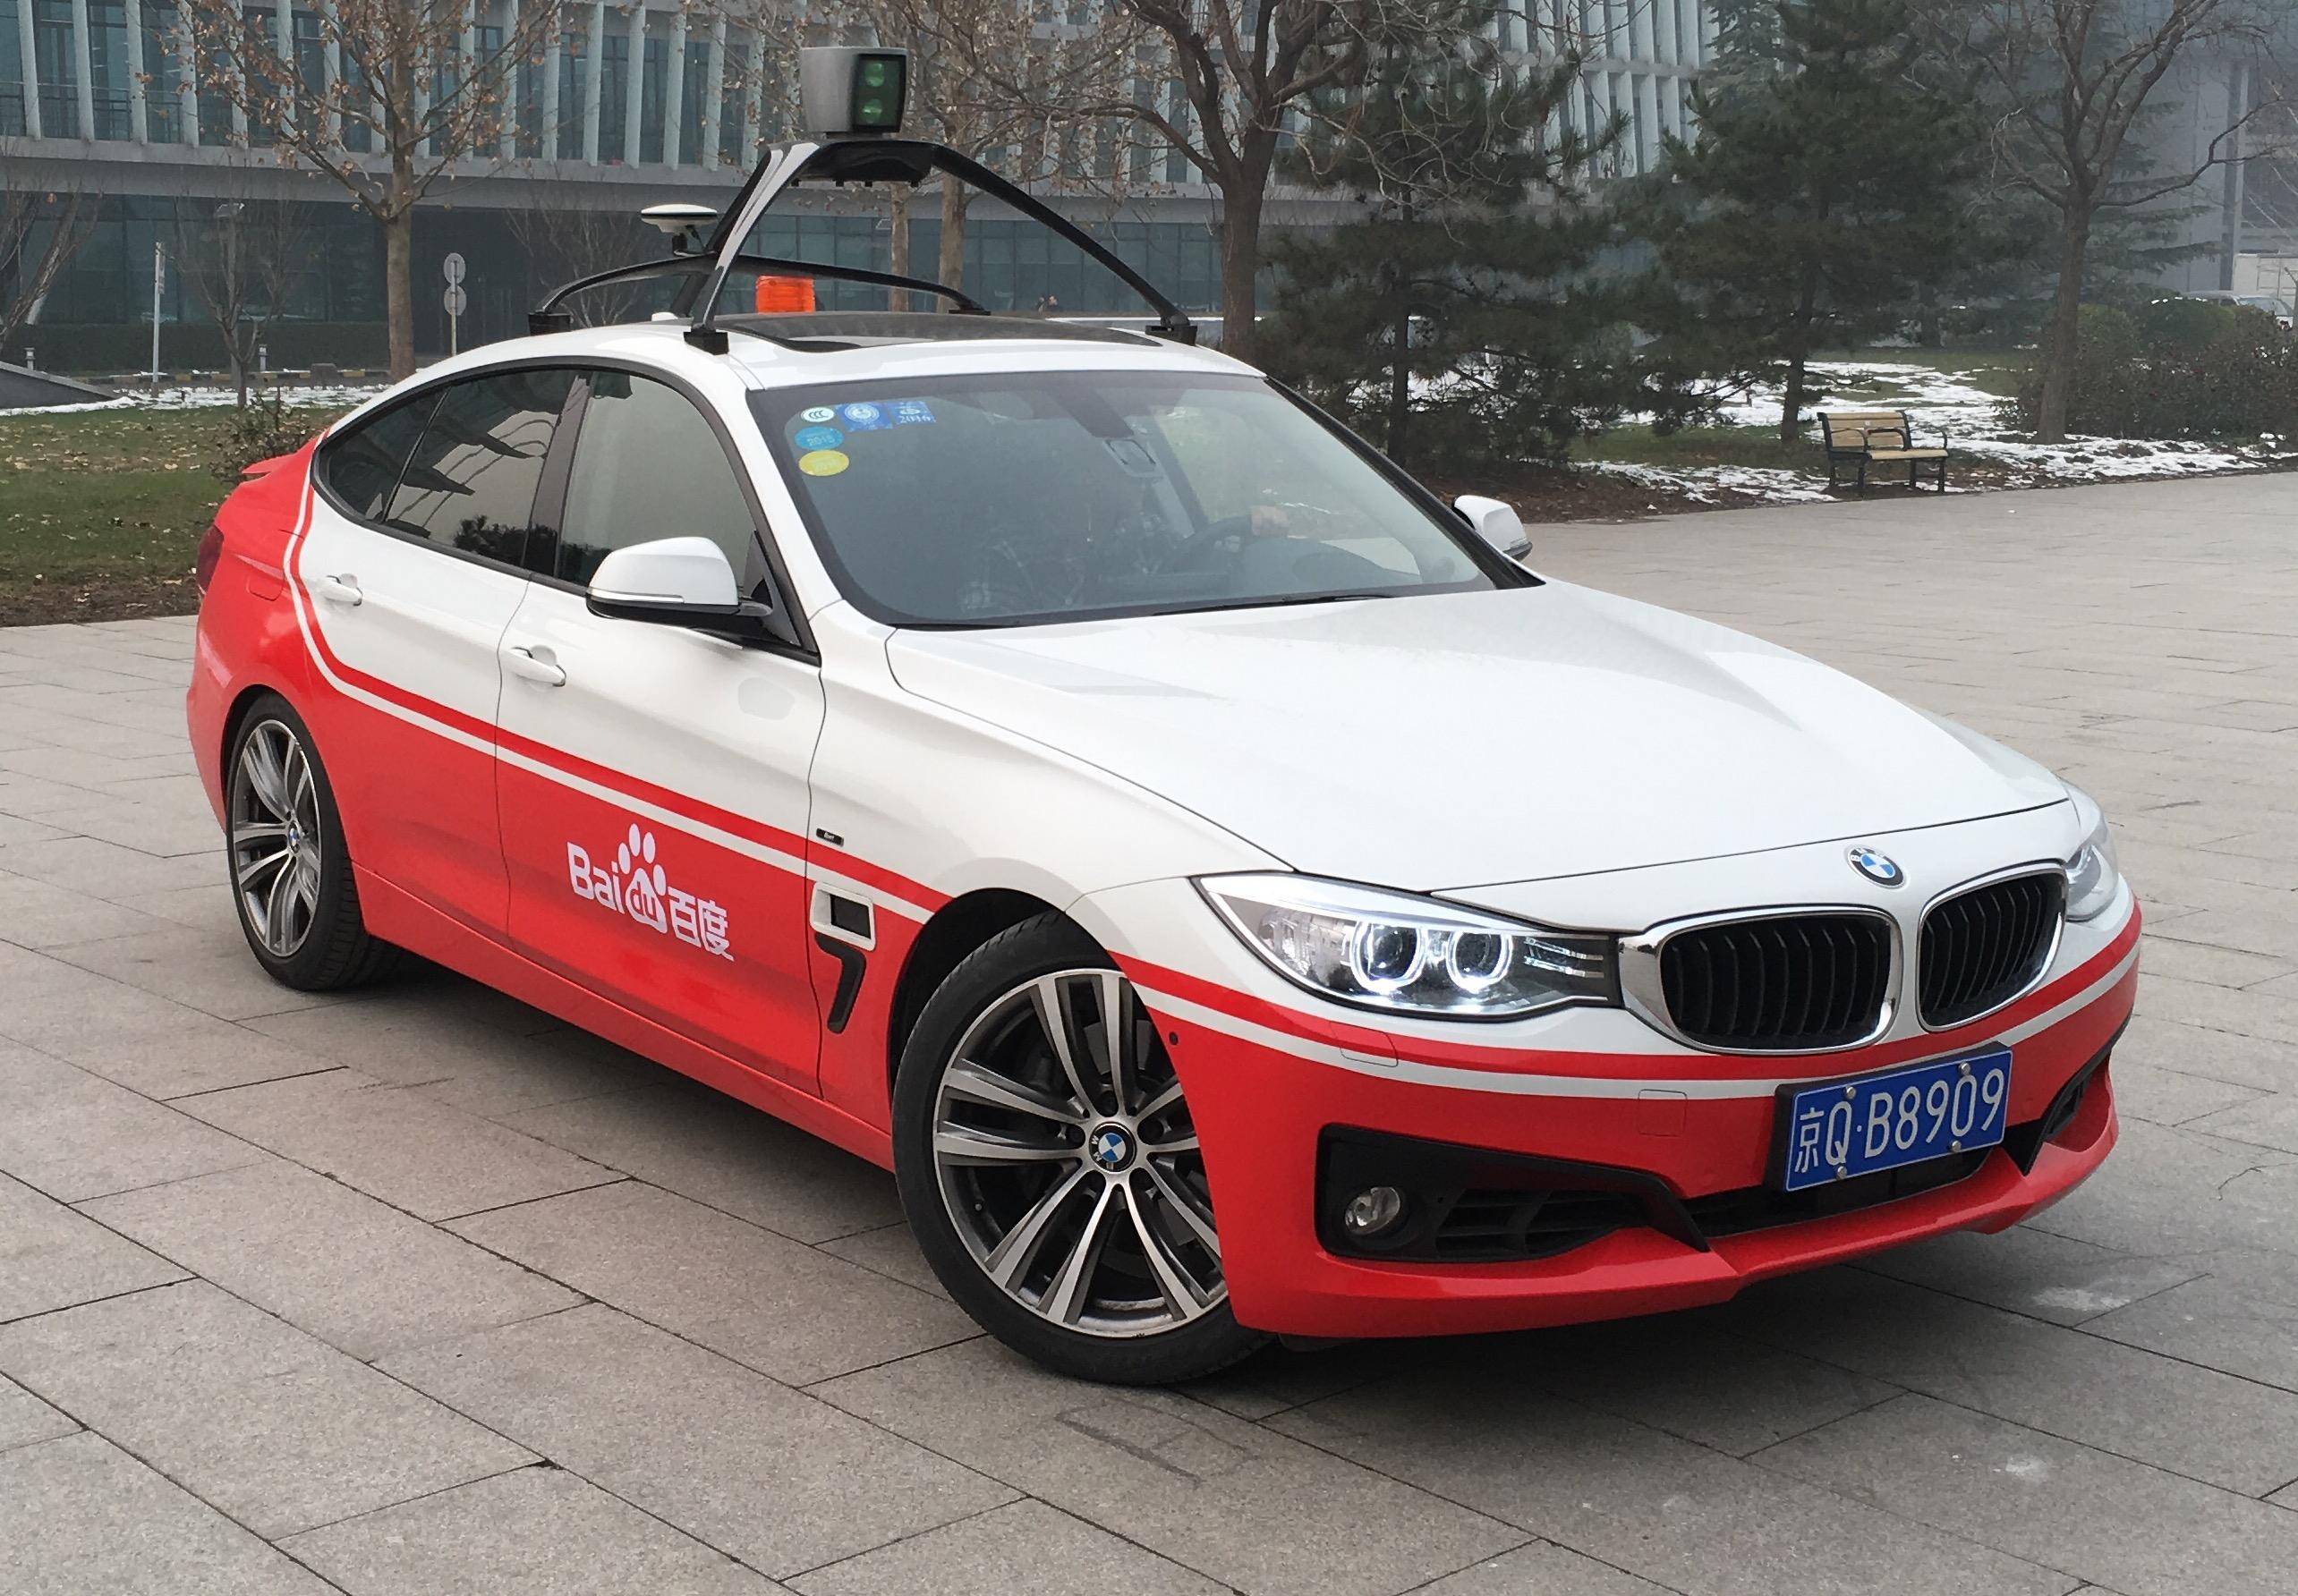 baidu-bmw-self-driving-car